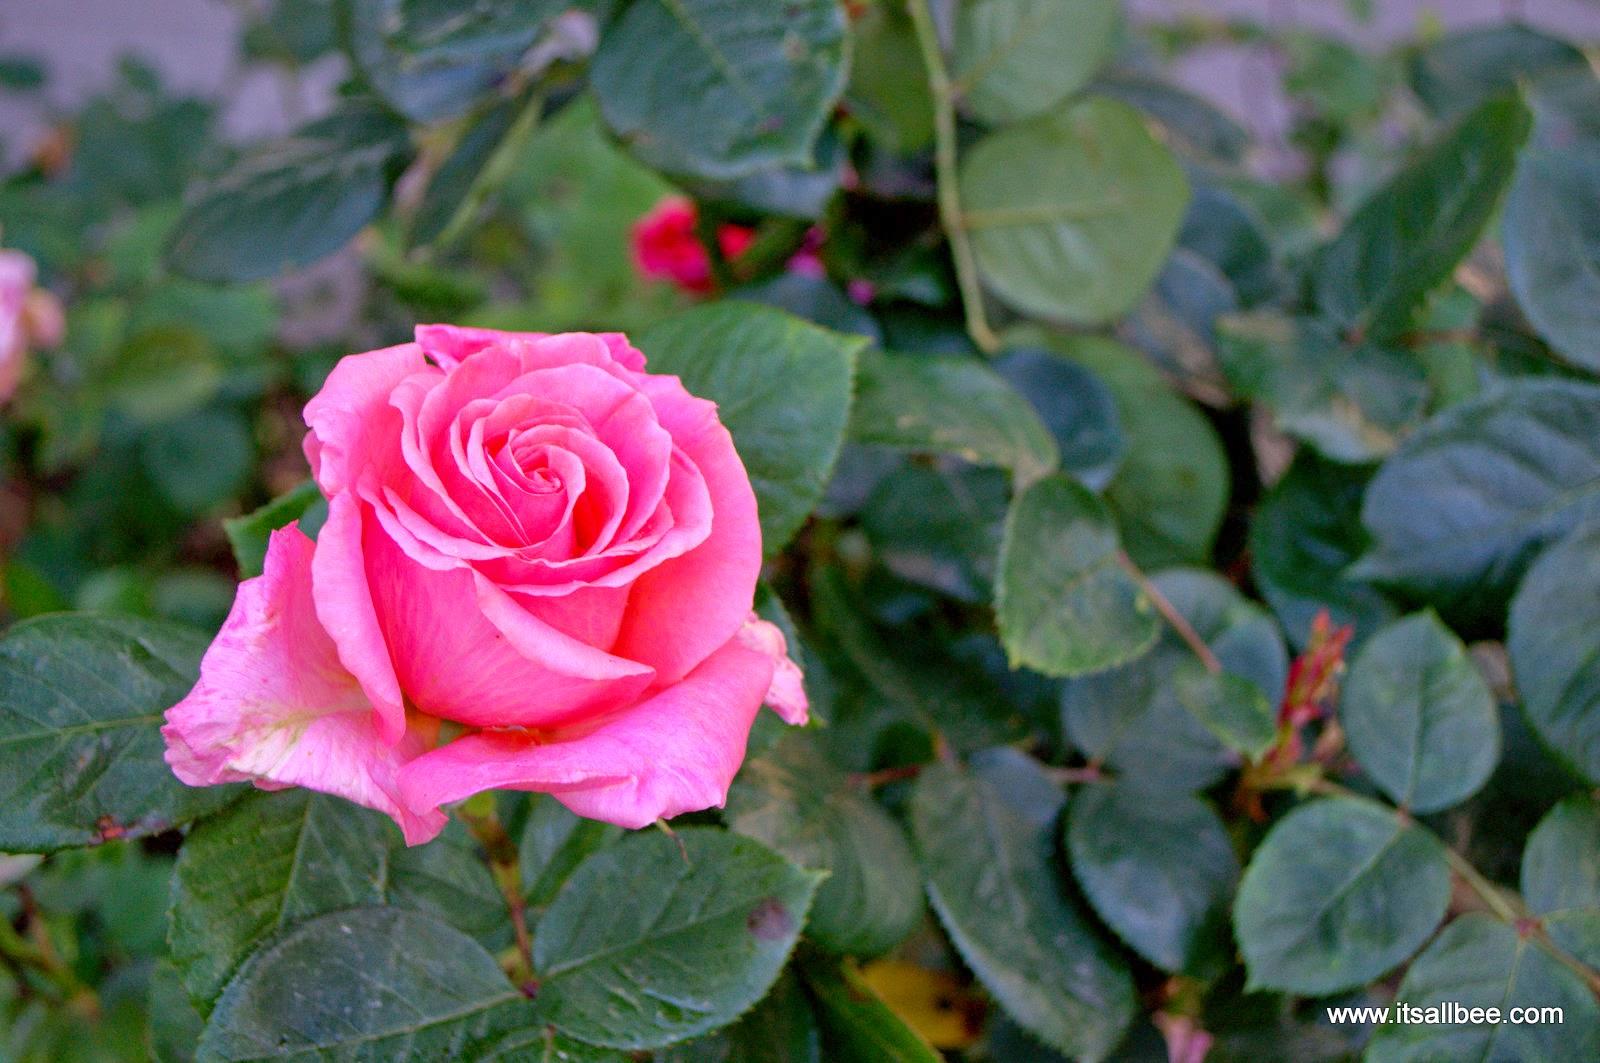 rose garden of Imperial War Museum London